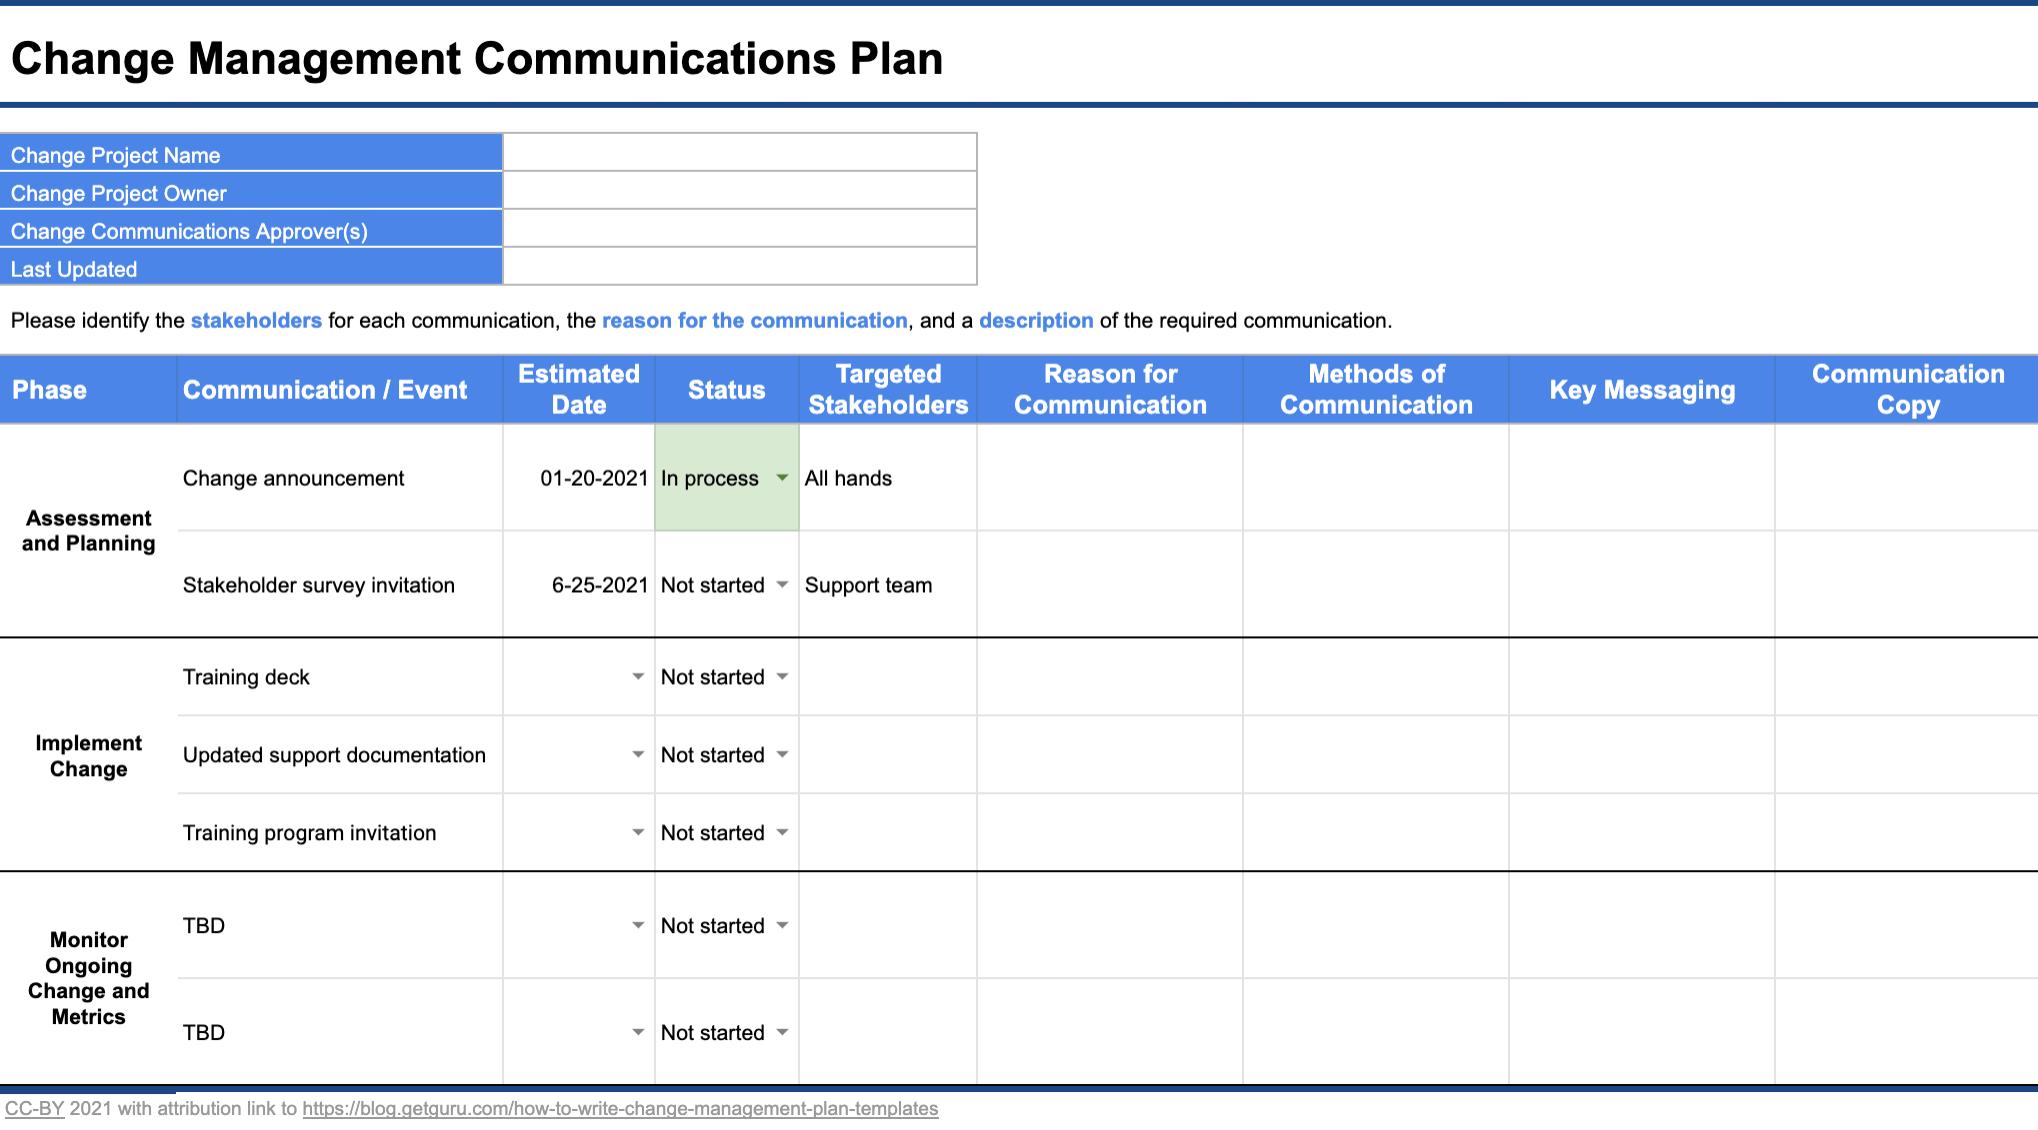 Change Management Communications Plan Template